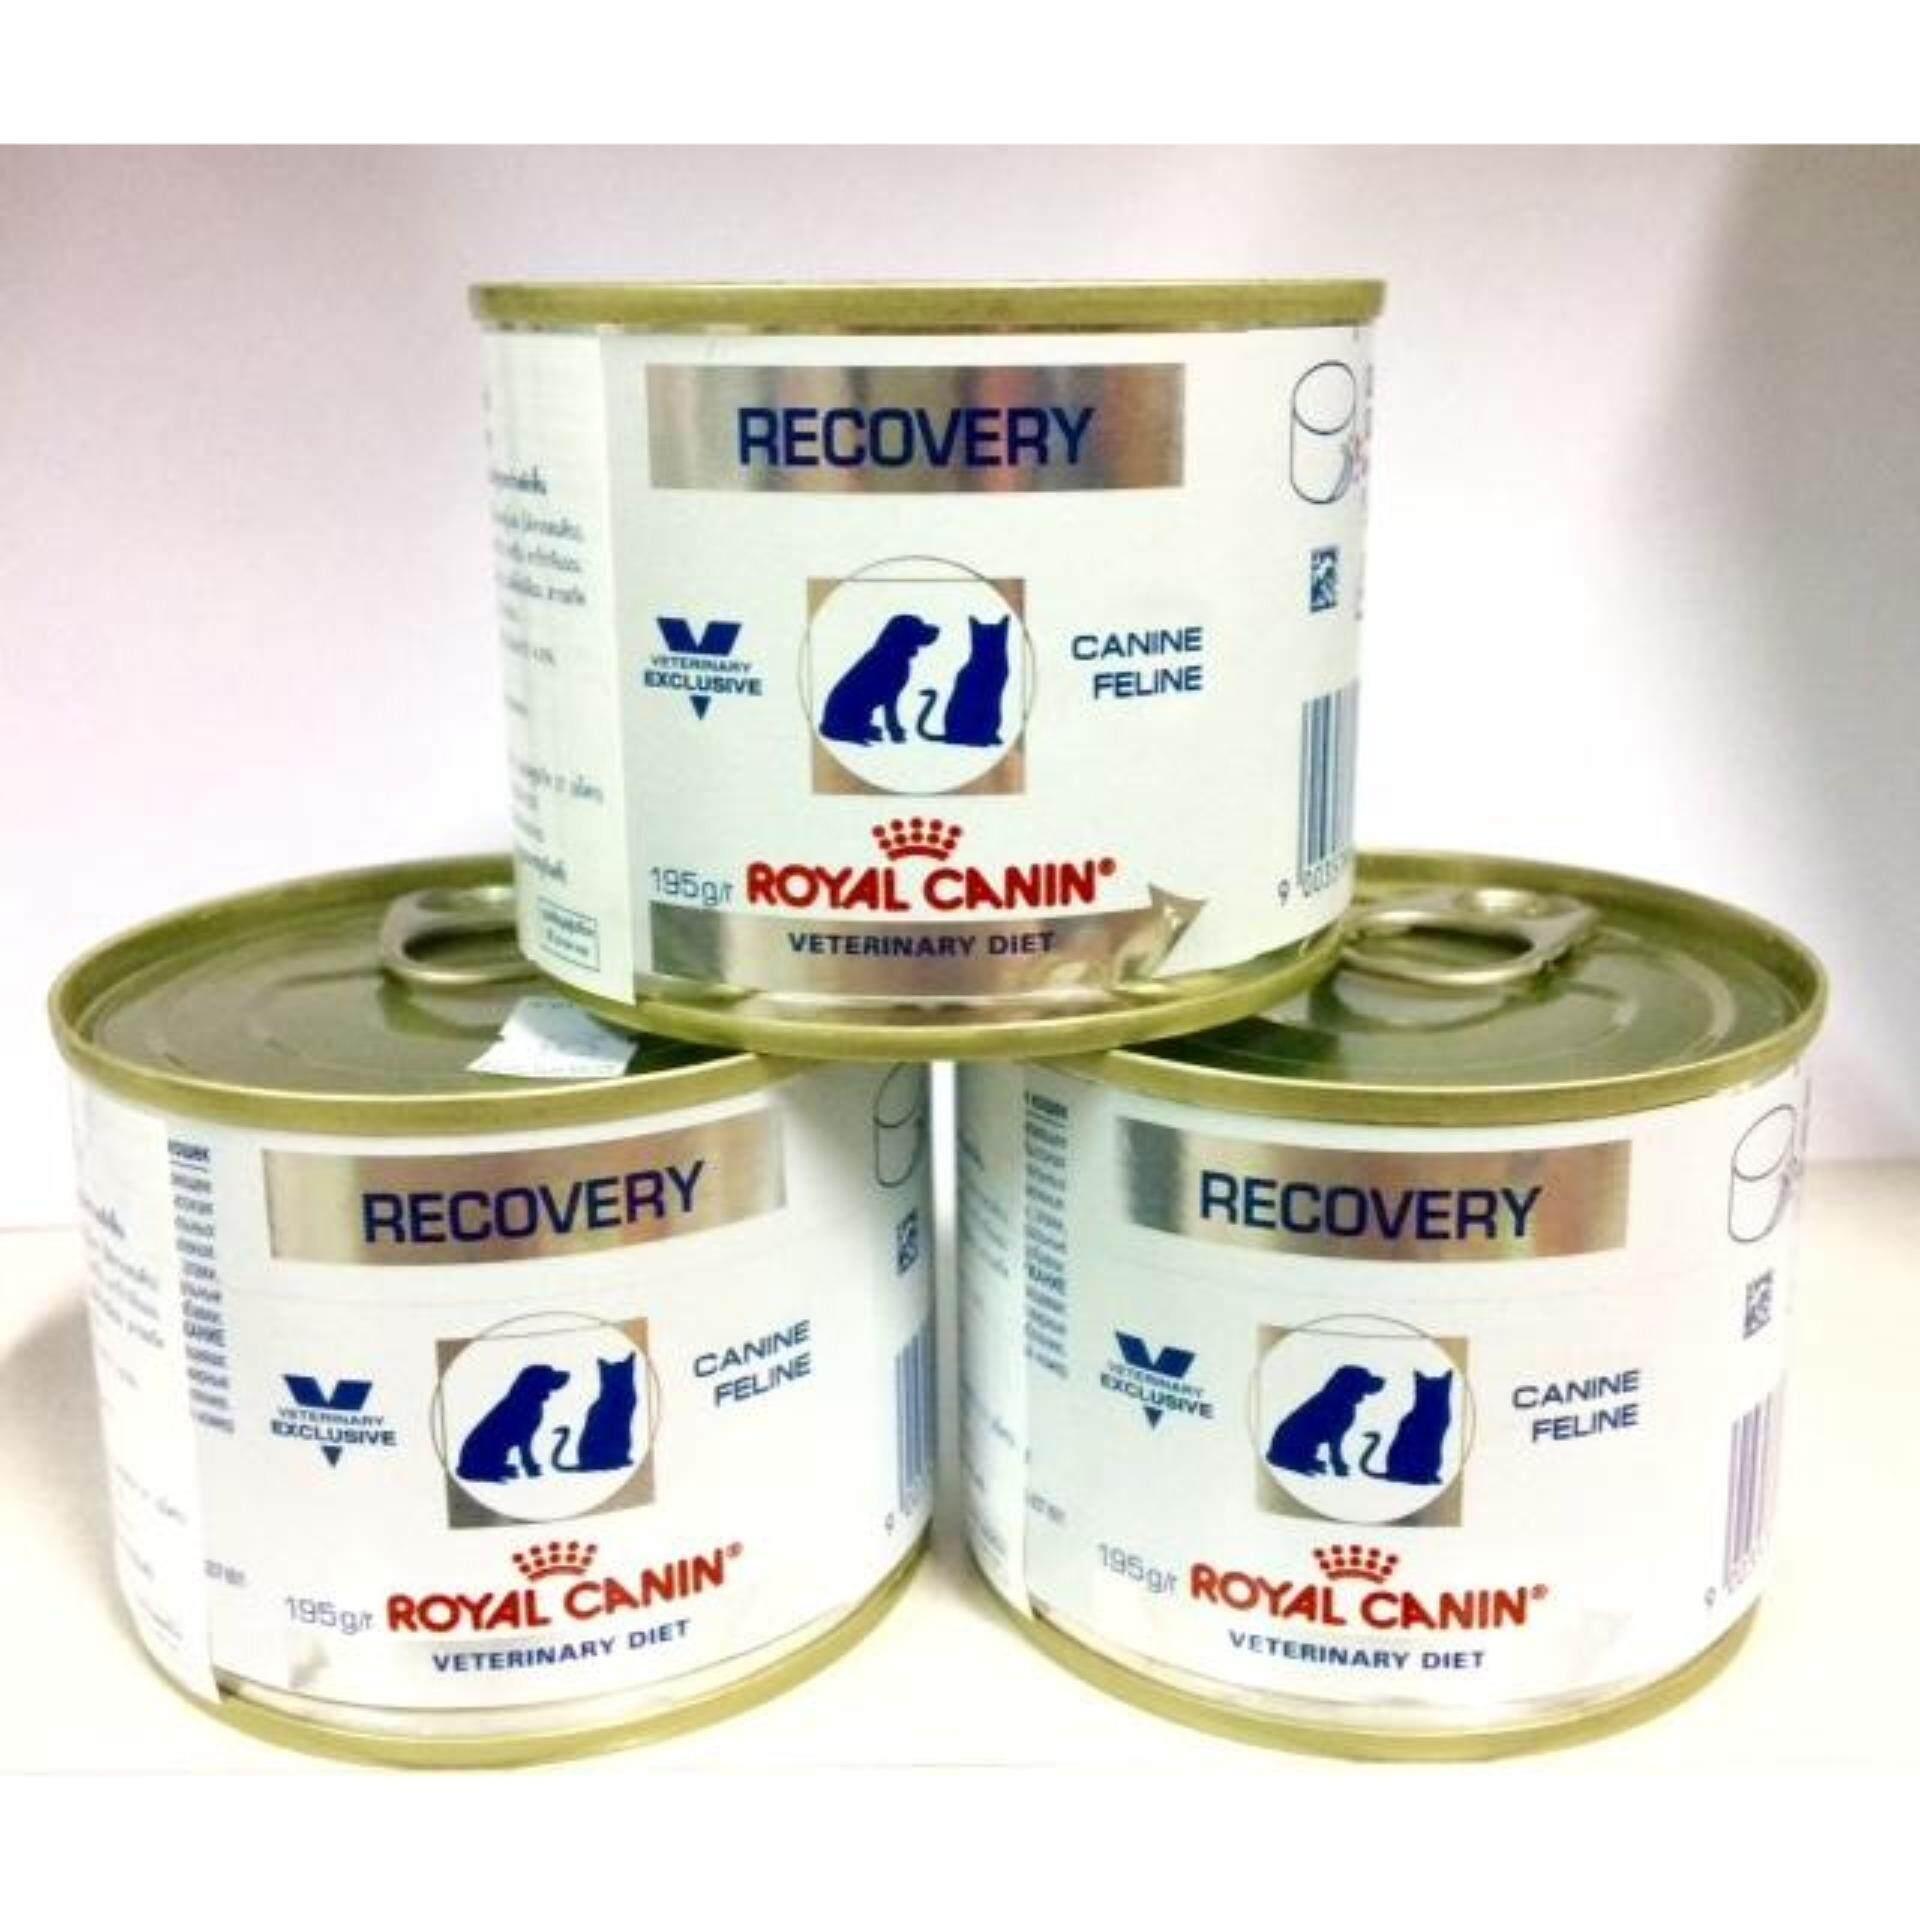 Recovery canine feline 195 g 3 canอาหารเปียกสุนัขแมวป่วยพักฟื้น3กระป๋อง